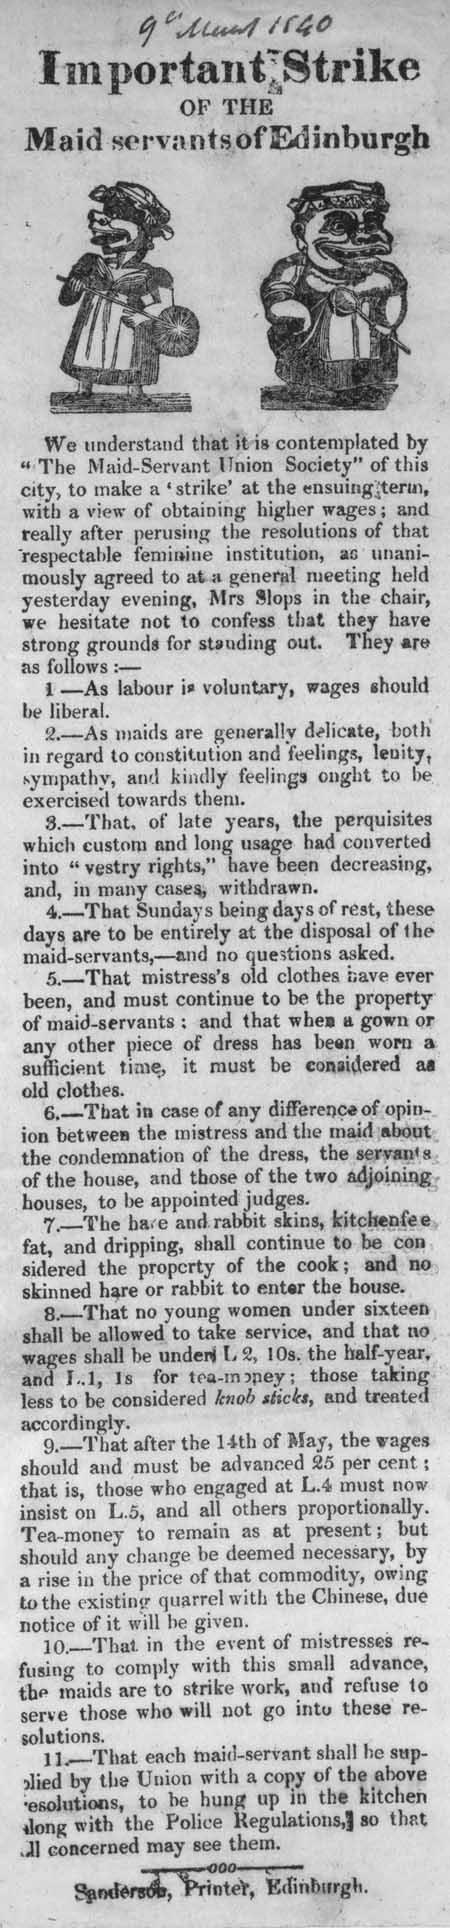 Broadside entitled 'Important Strike of the Maid Servants of Edinburgh'